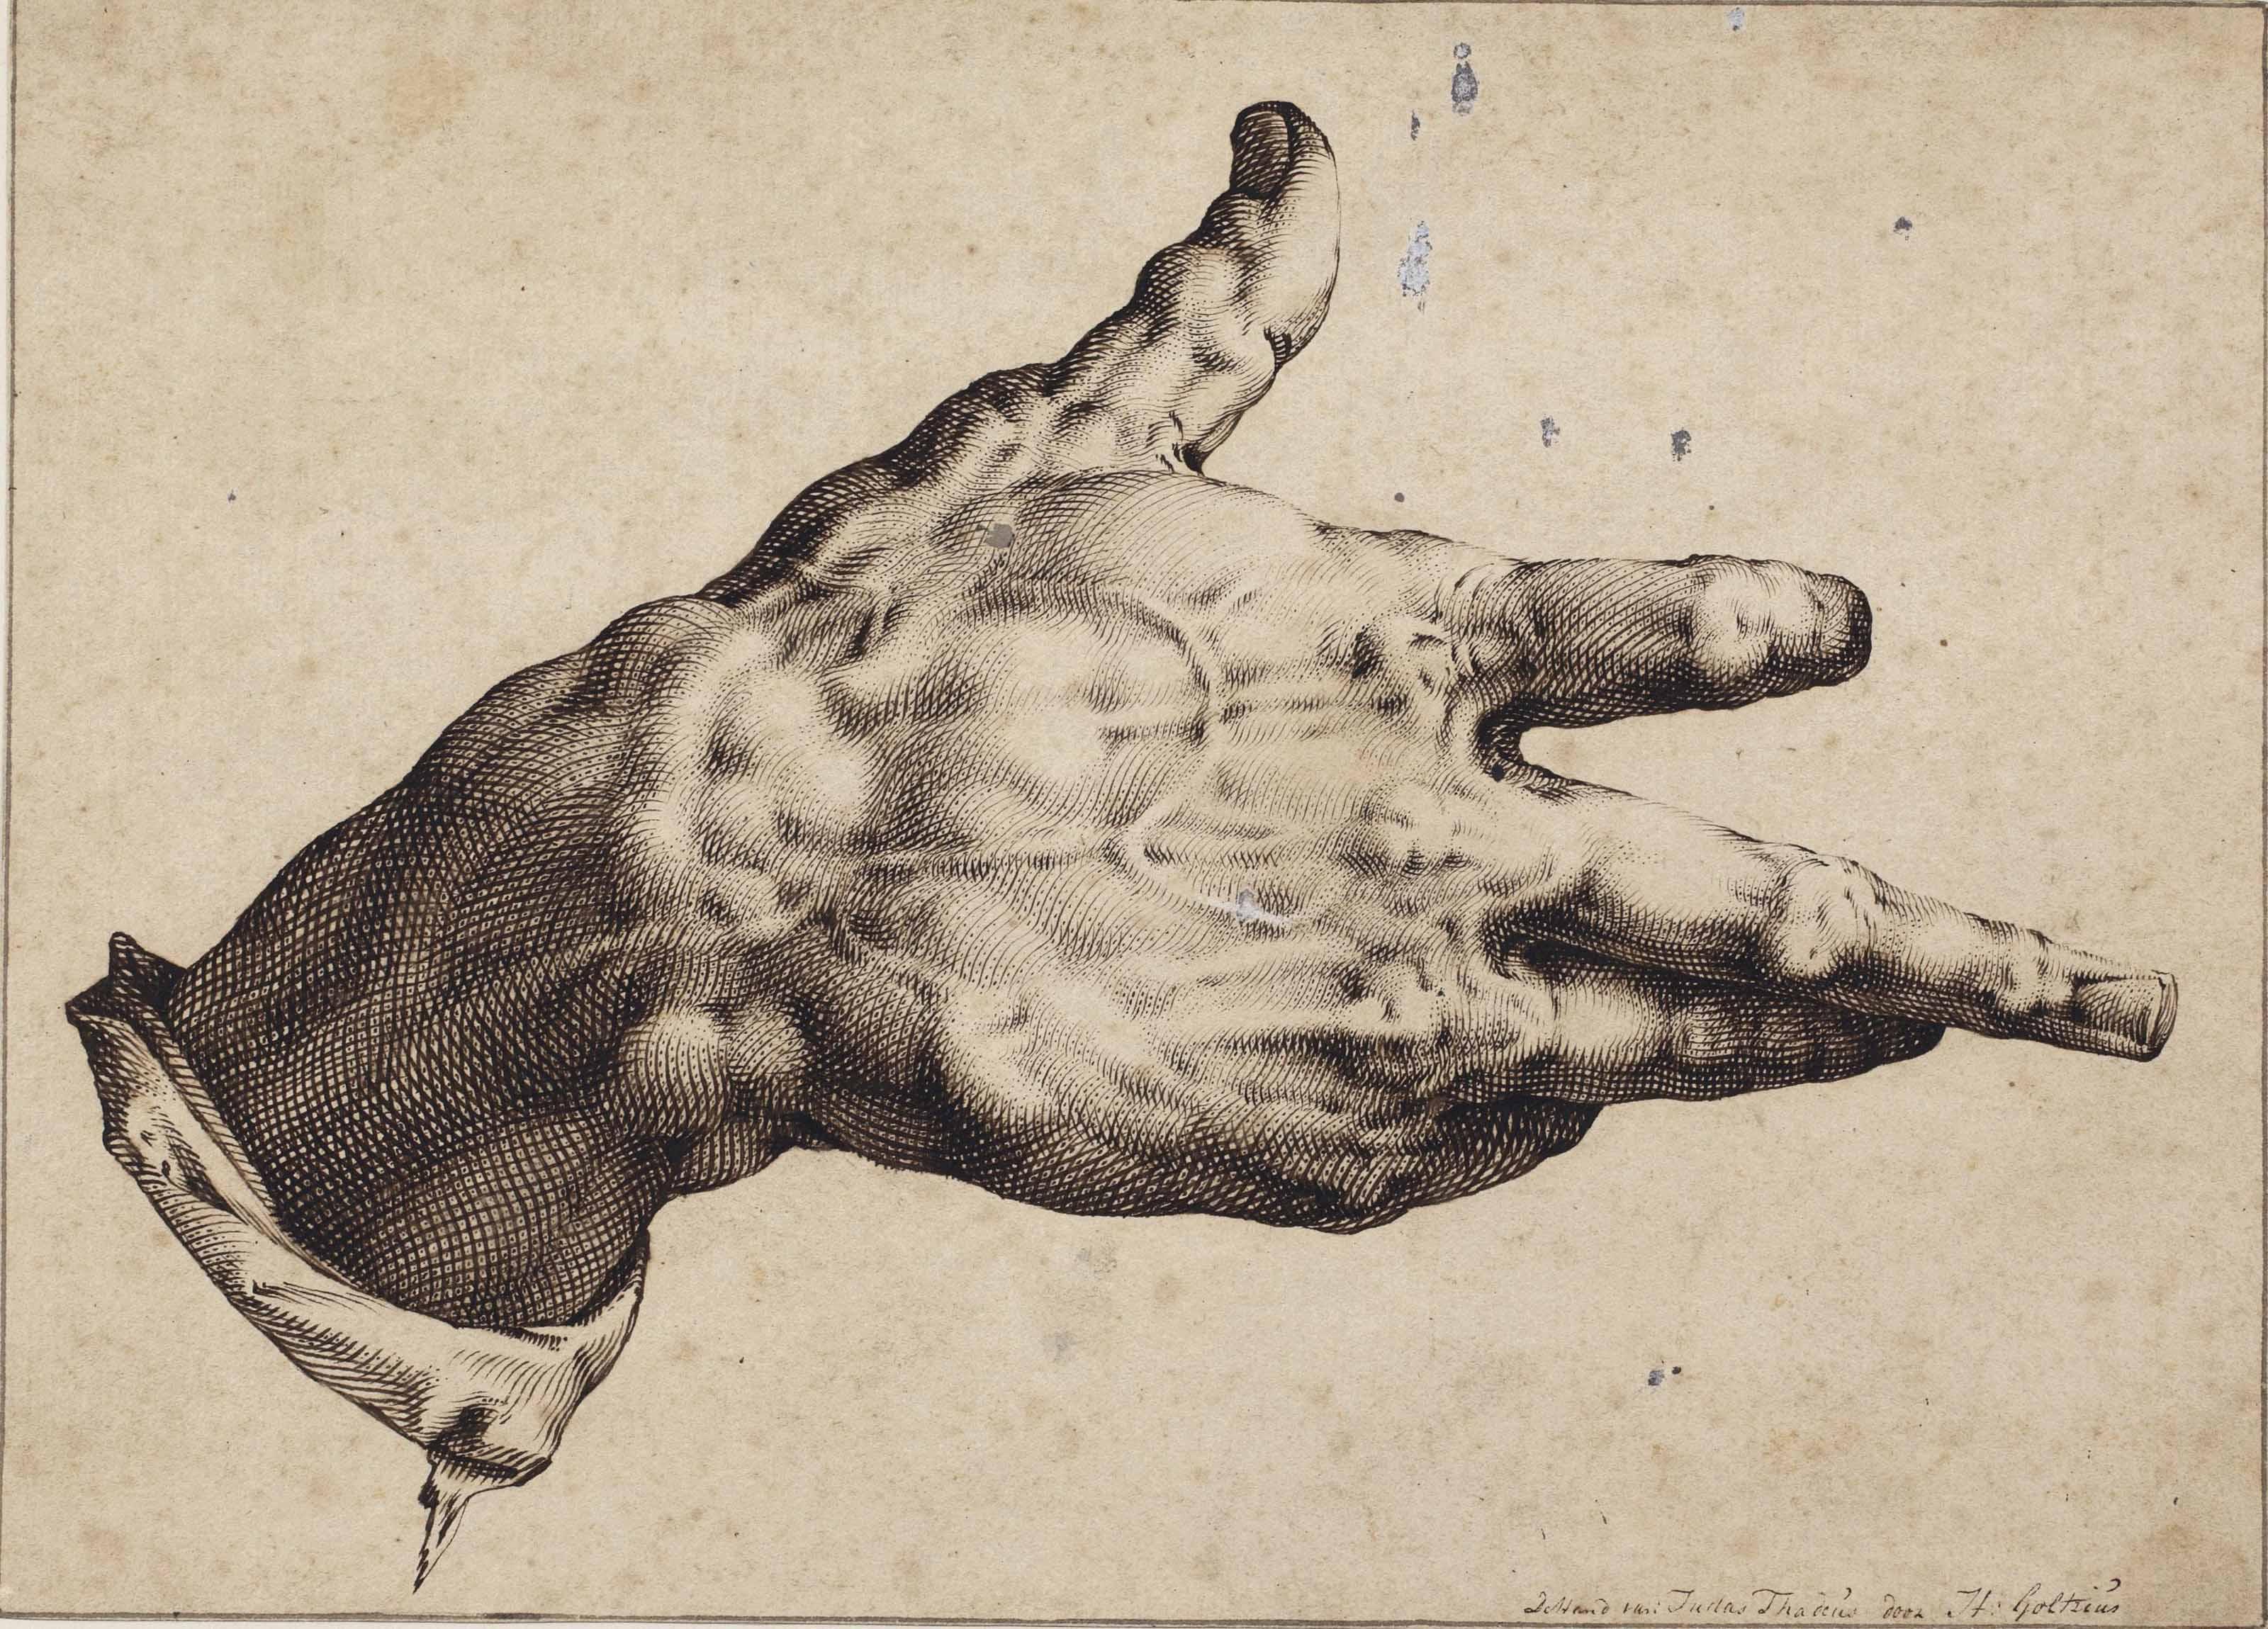 Hendrick Goltzius (Mühlbracht 1558-1617 Haarlem)